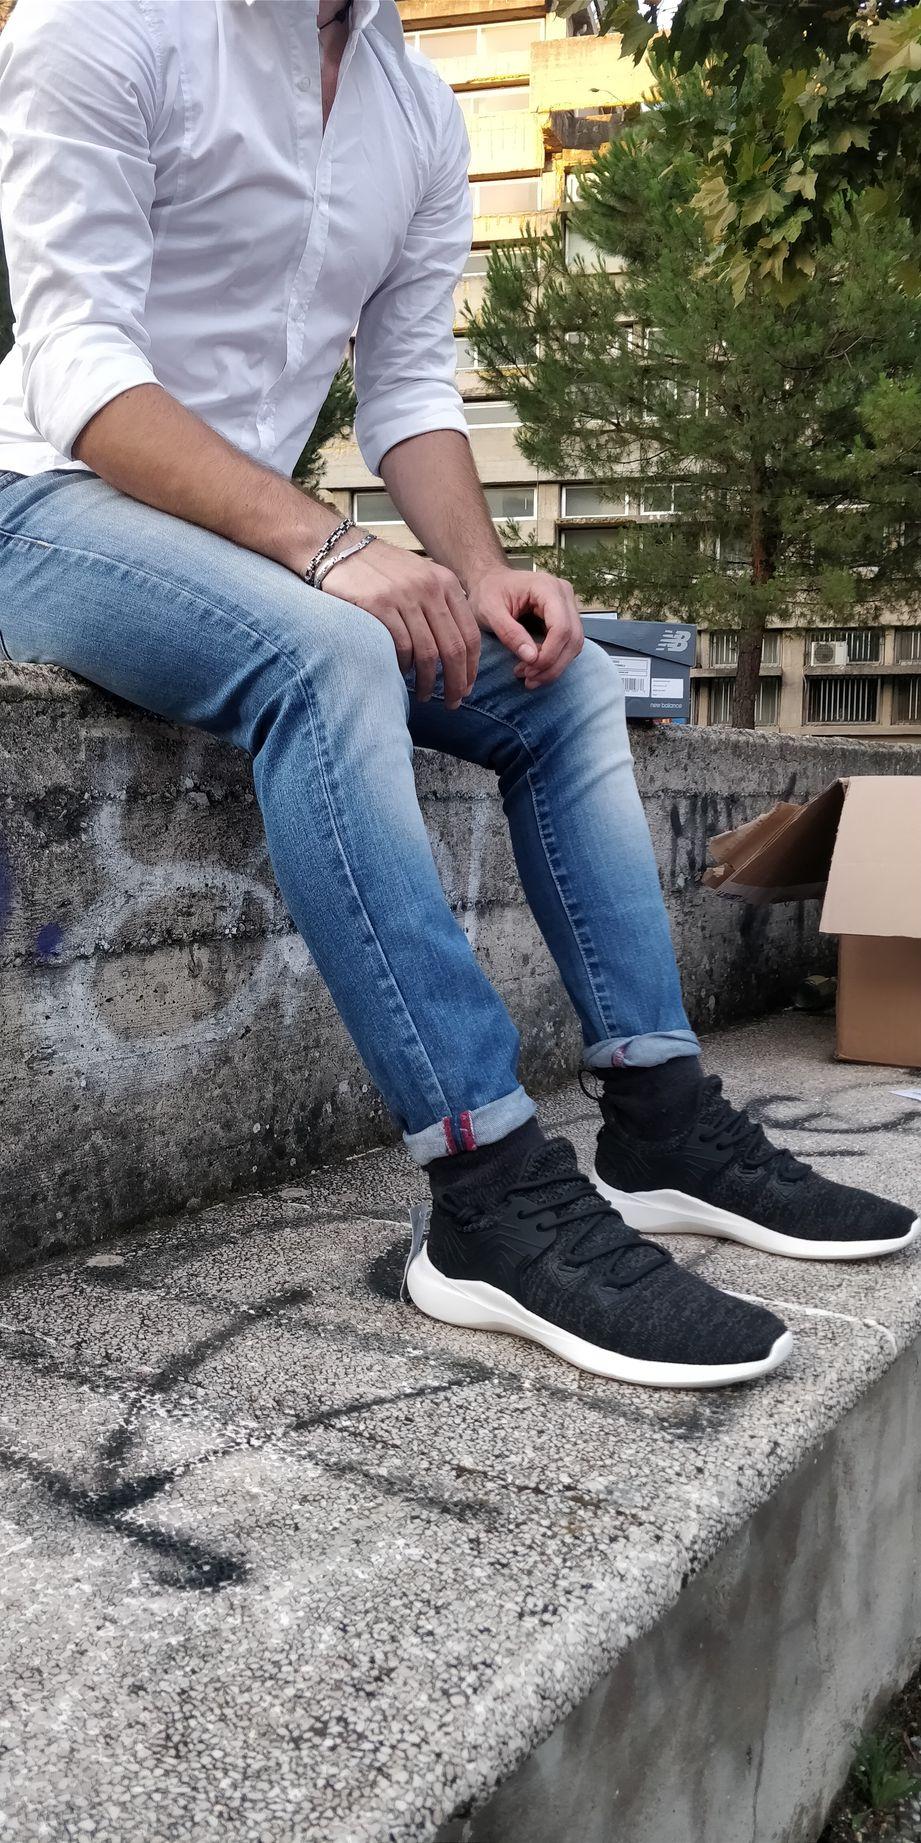 Joma-Scarpe-sportive-Sneakers-Lifestyle-sportswear-Nero-JCSM-mesh miniatura 6